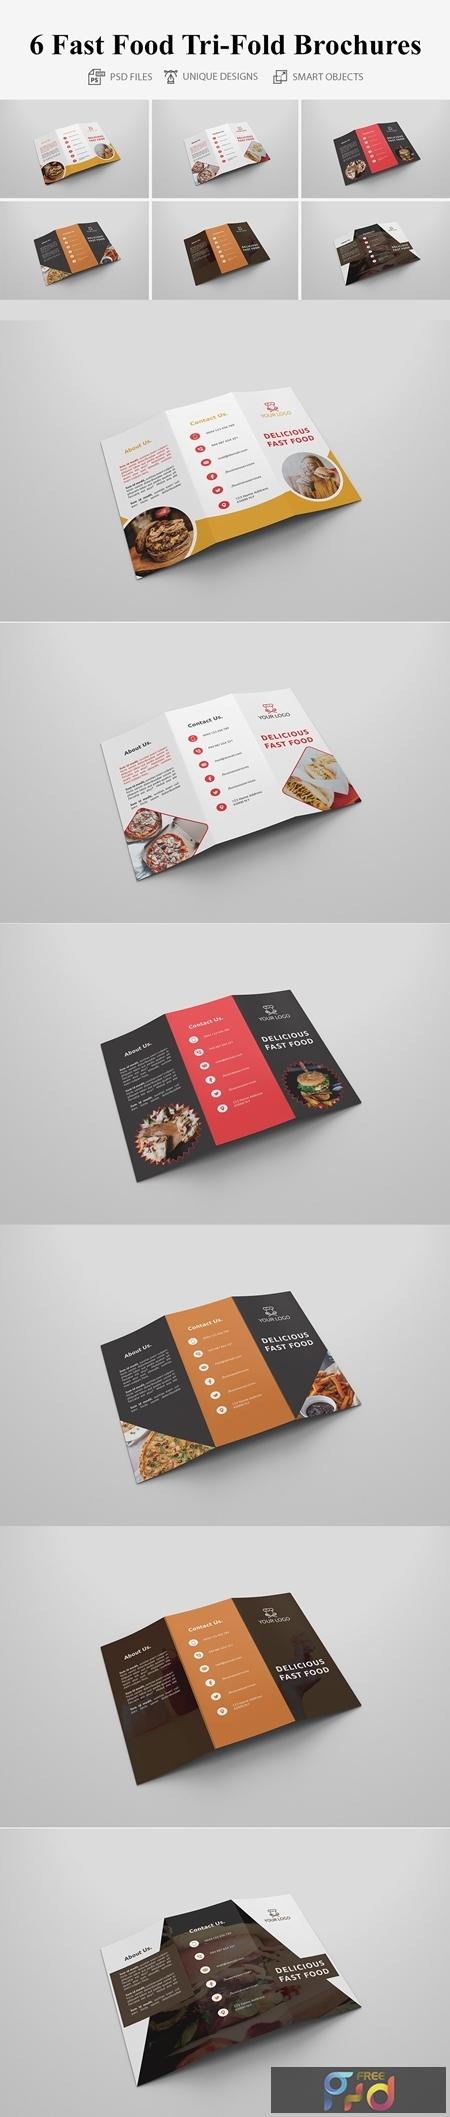 6 Fast Food Tri-fold Brochures 4160653 1